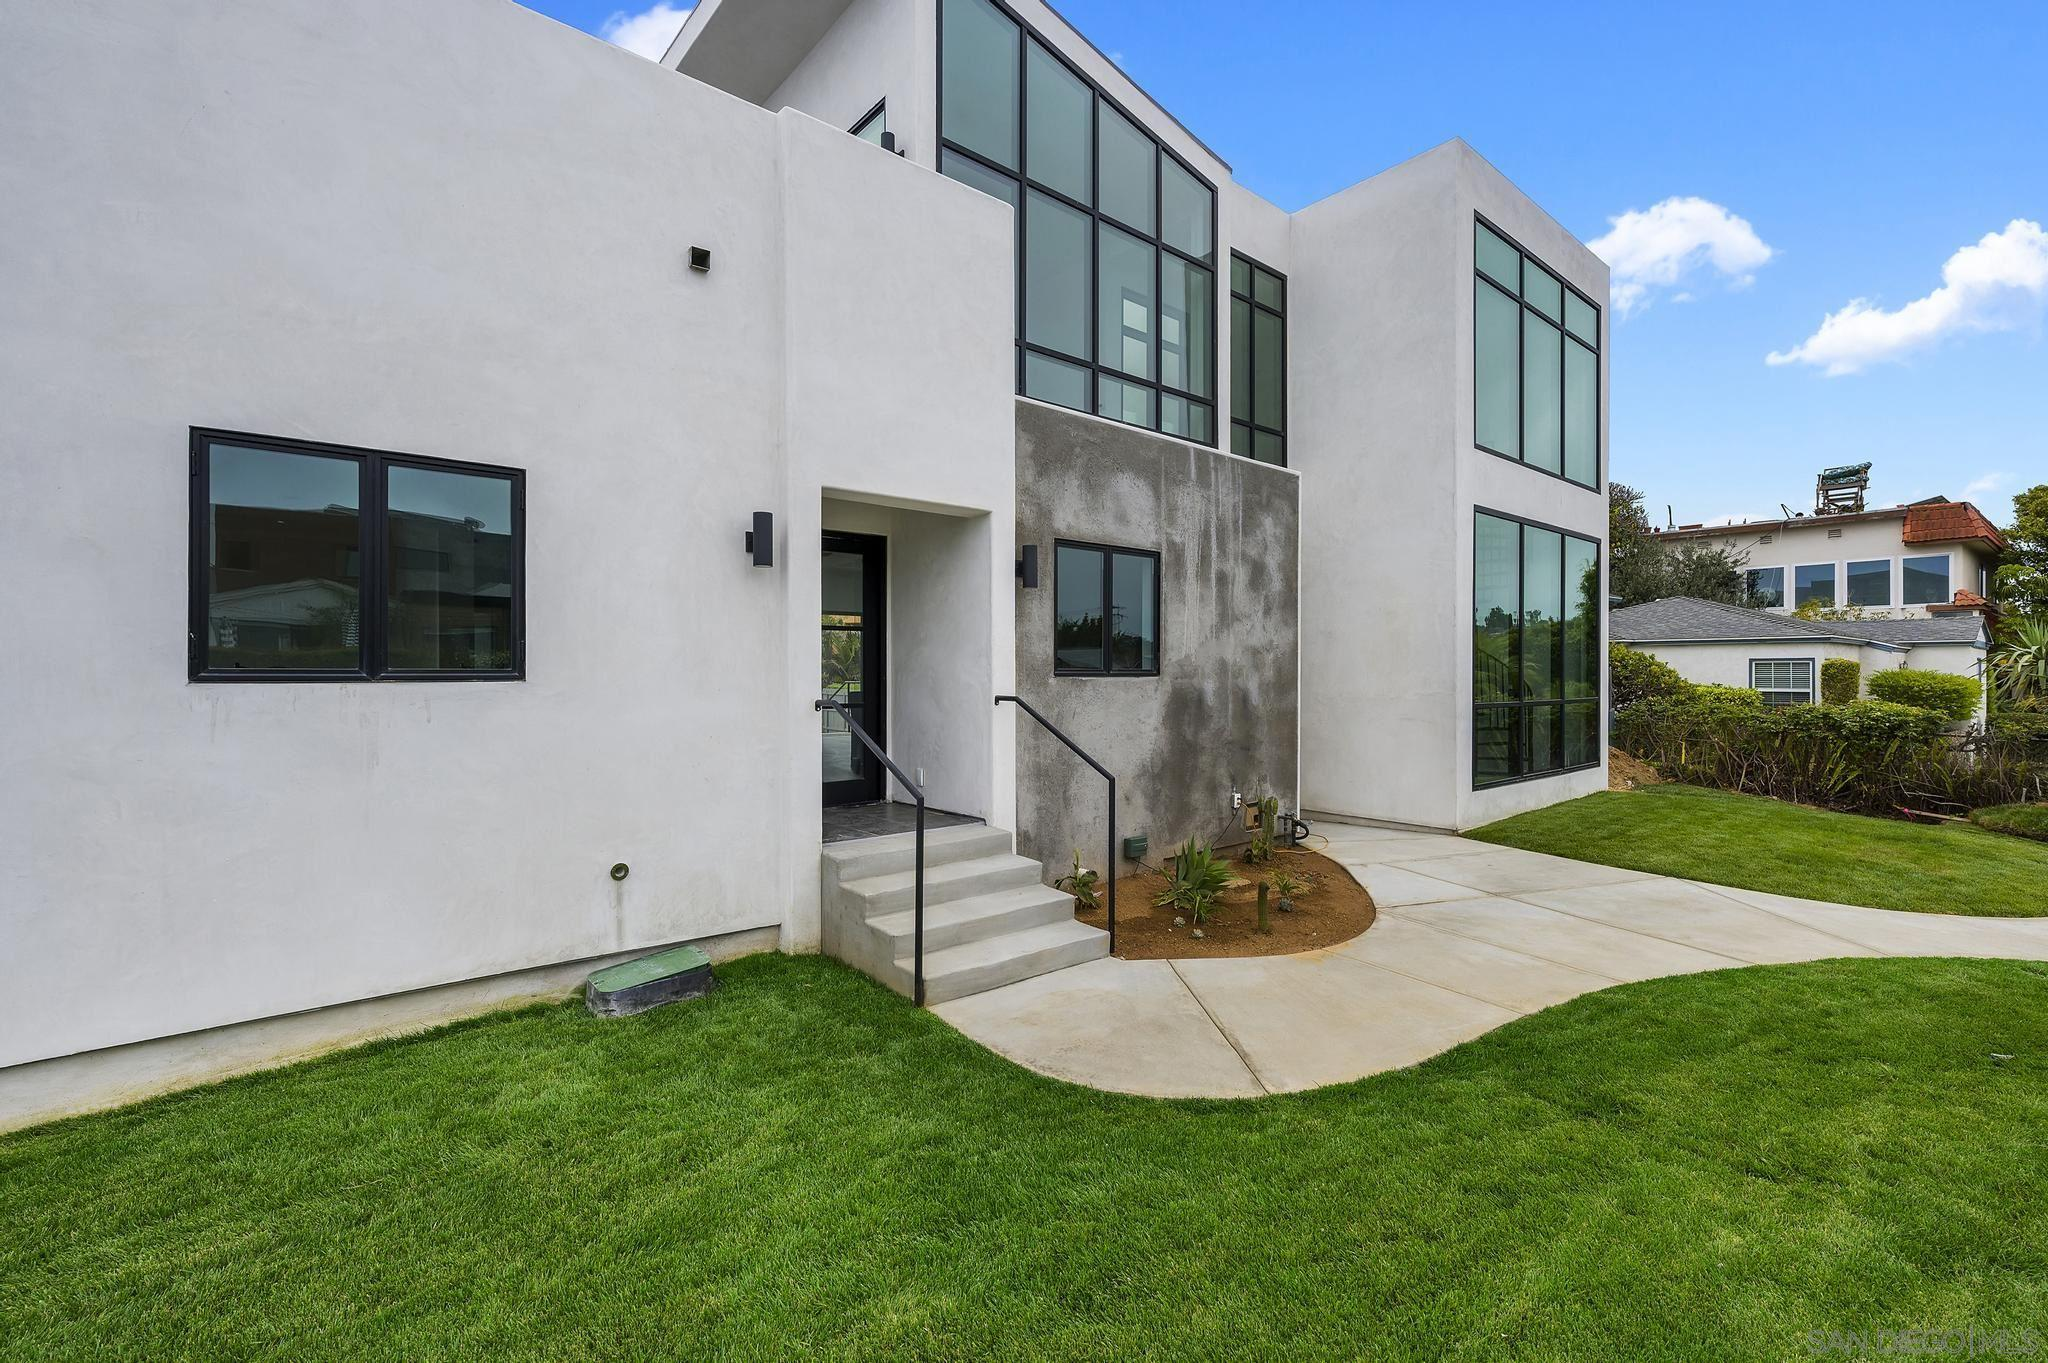 3505 Talbot Street, San Diego, CA 92106